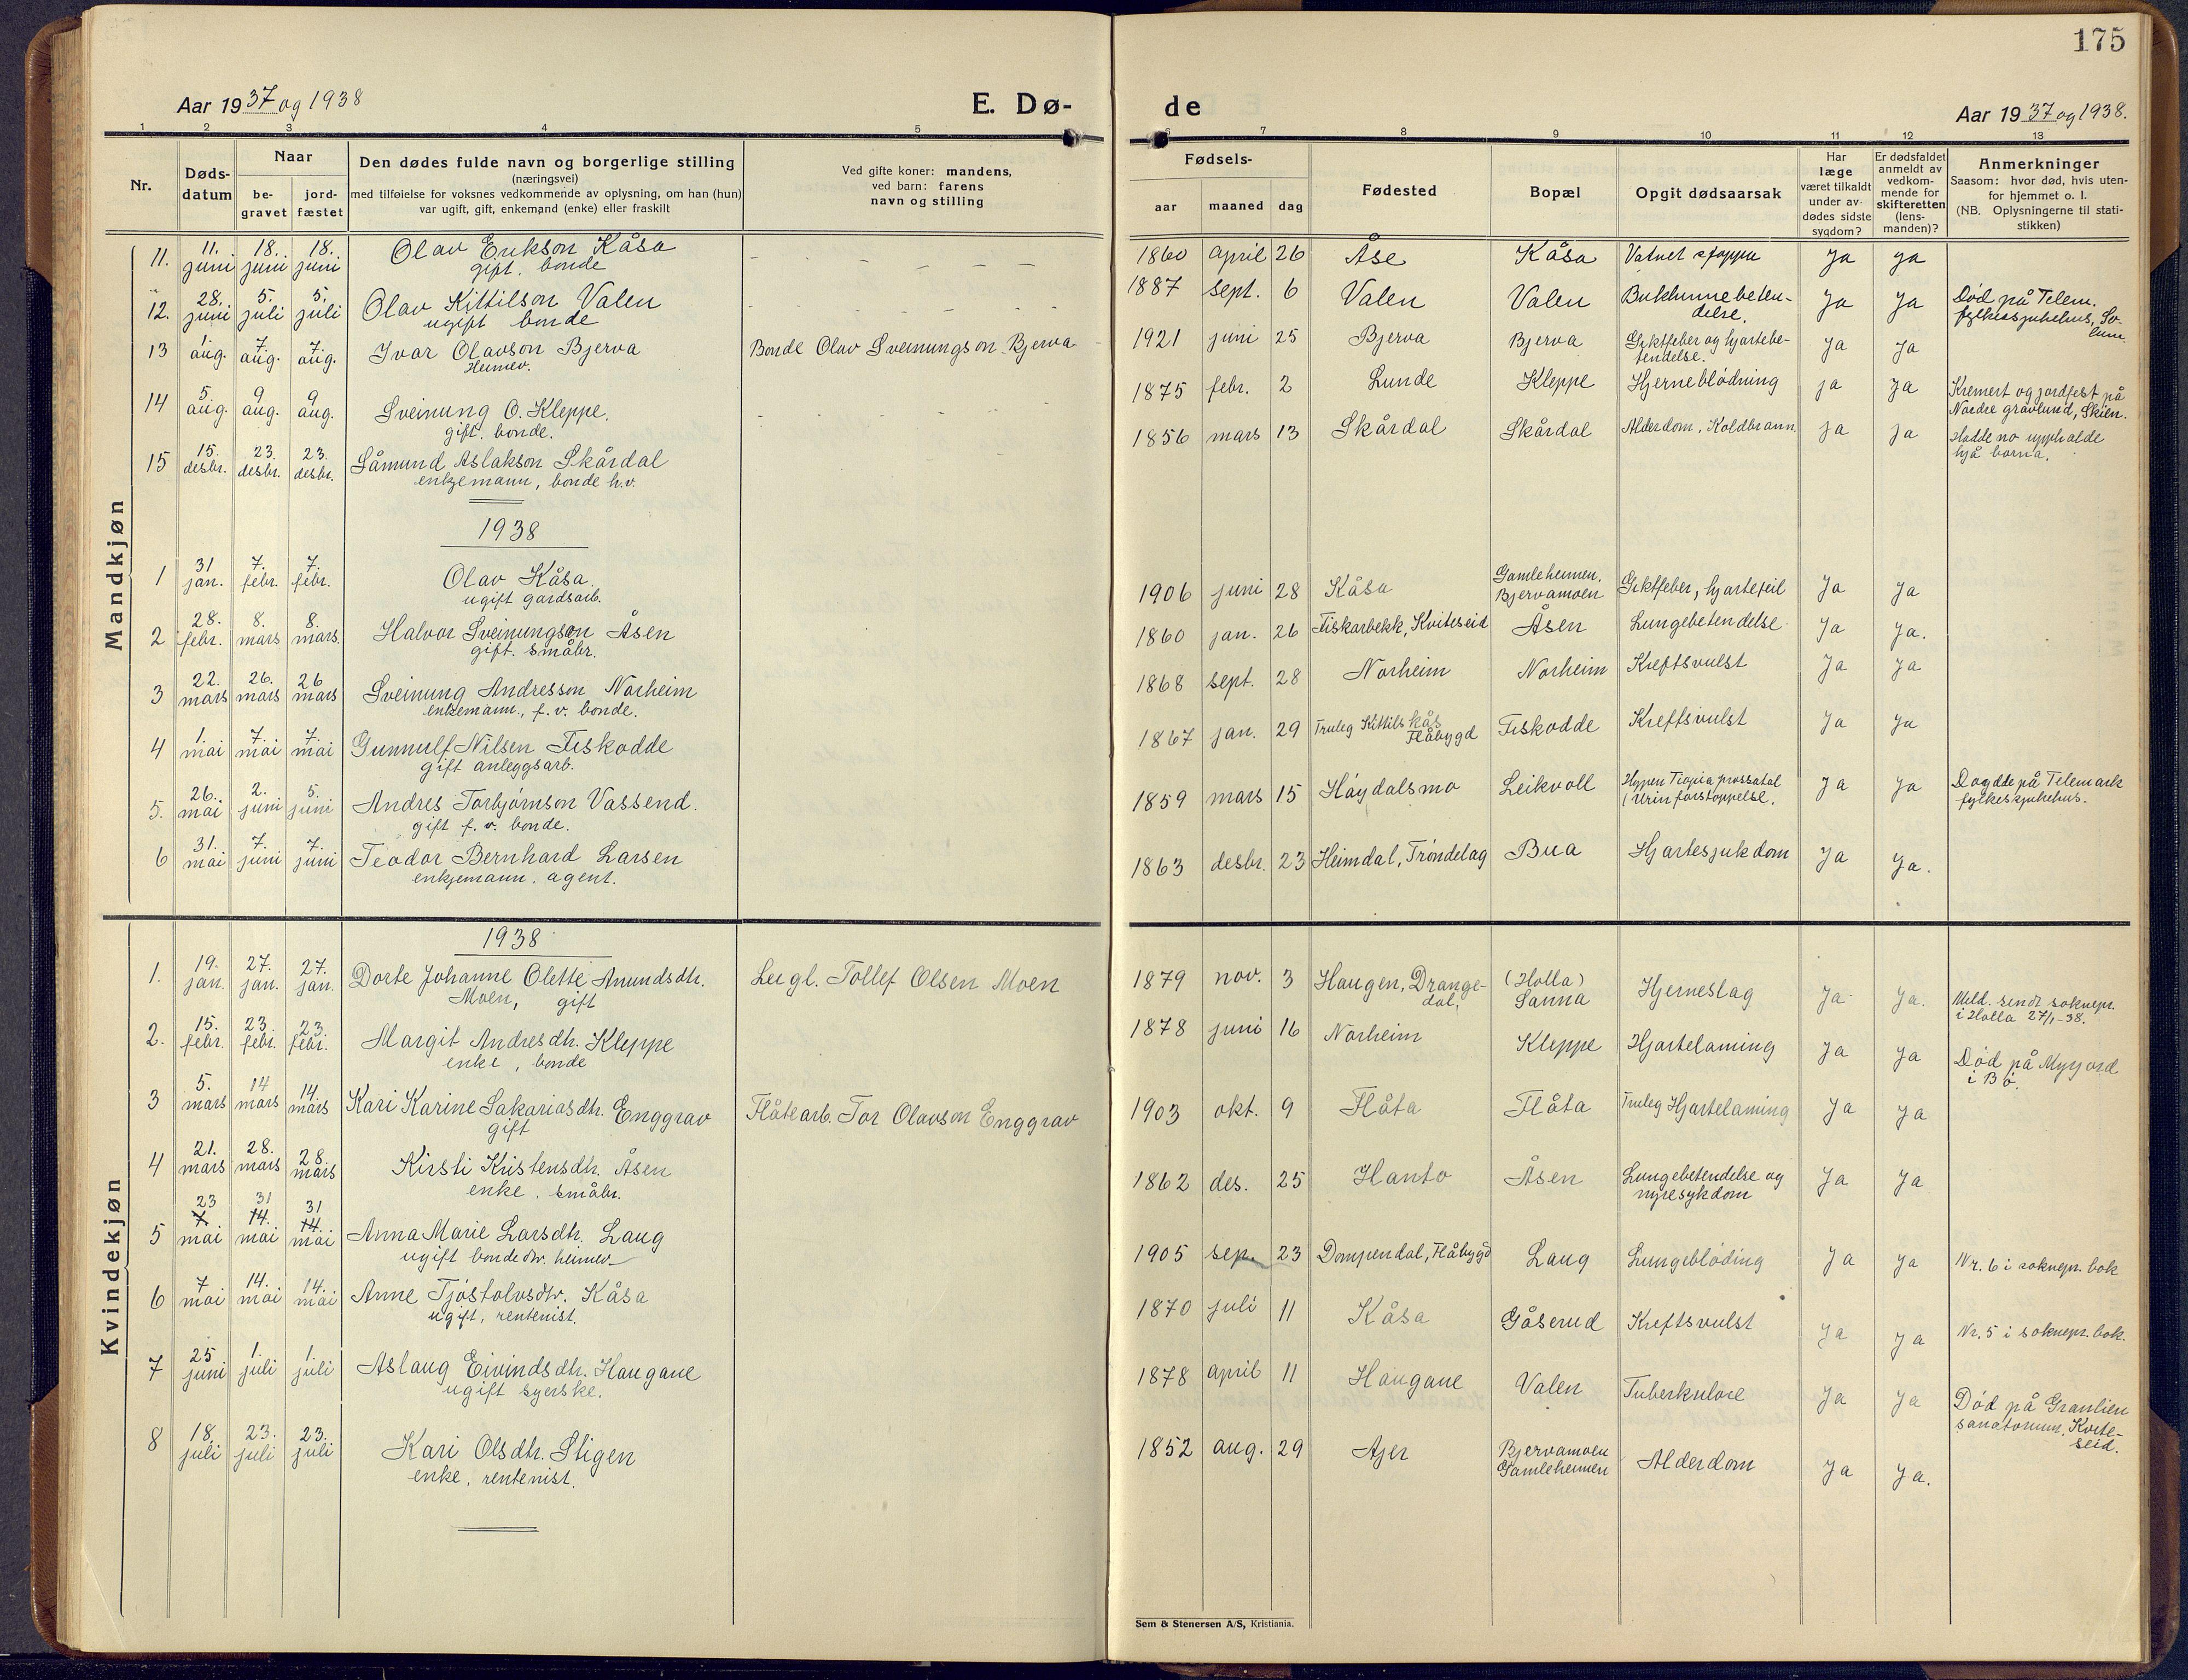 SAKO, Lunde kirkebøker, F/Fa/L0006: Ministerialbok nr. I 6, 1922-1940, s. 175